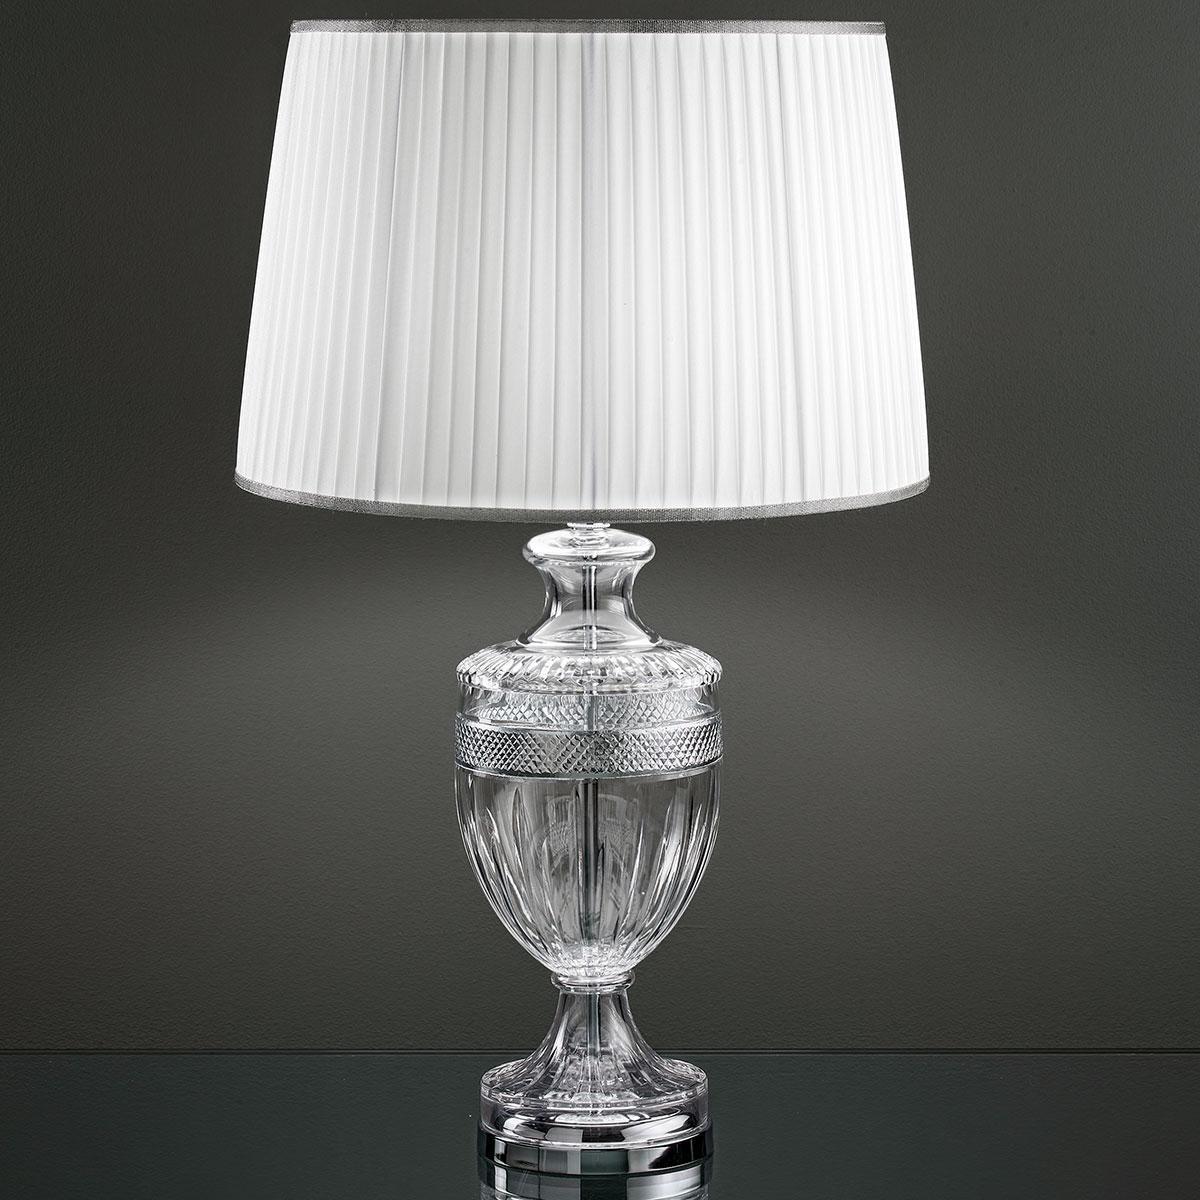 """Giotto"" lampara de sobremesa veneciana en cristal - 1 luce - transparent con cromo hardware"